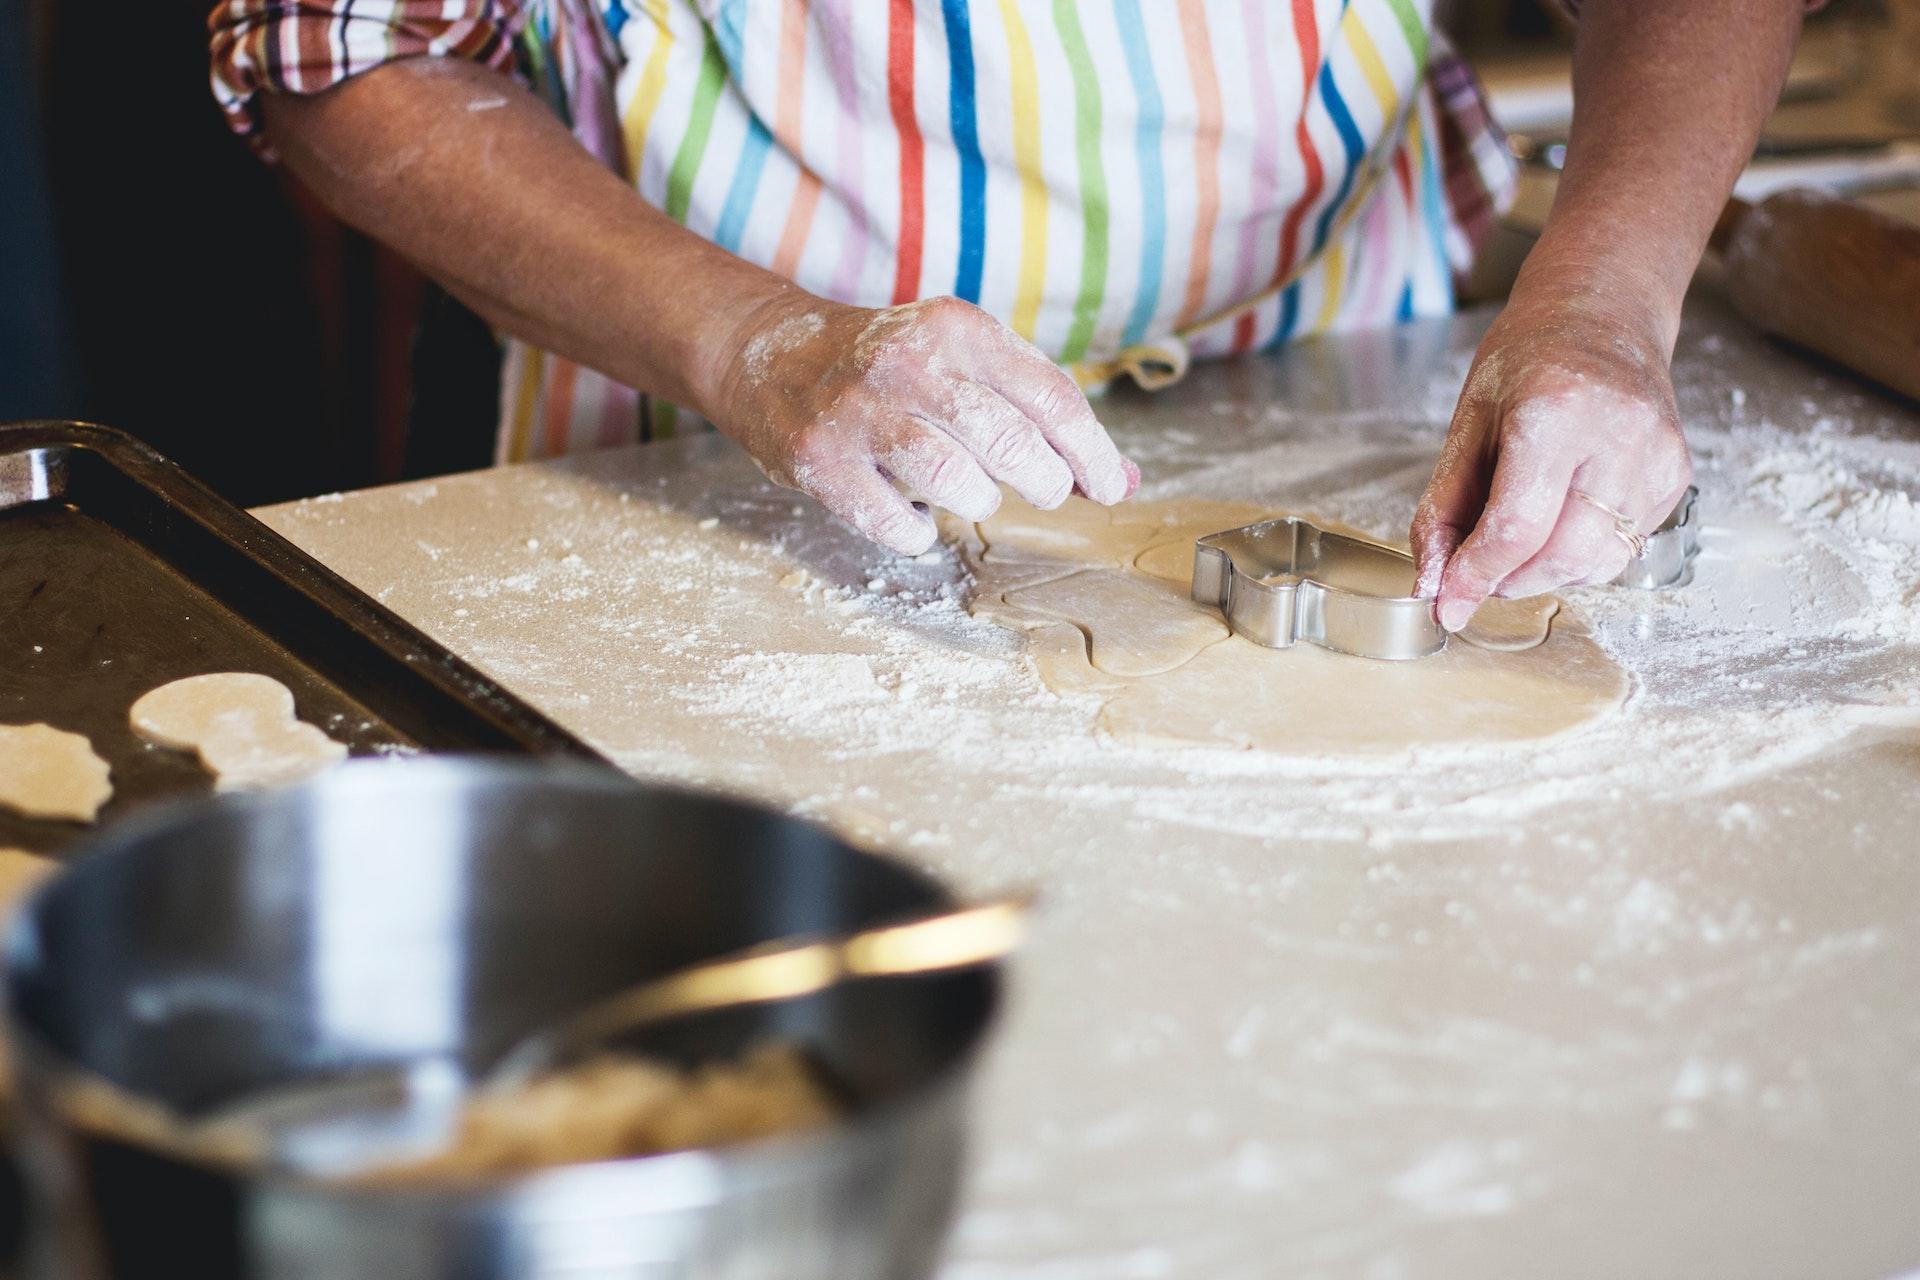 Baking Food Safety